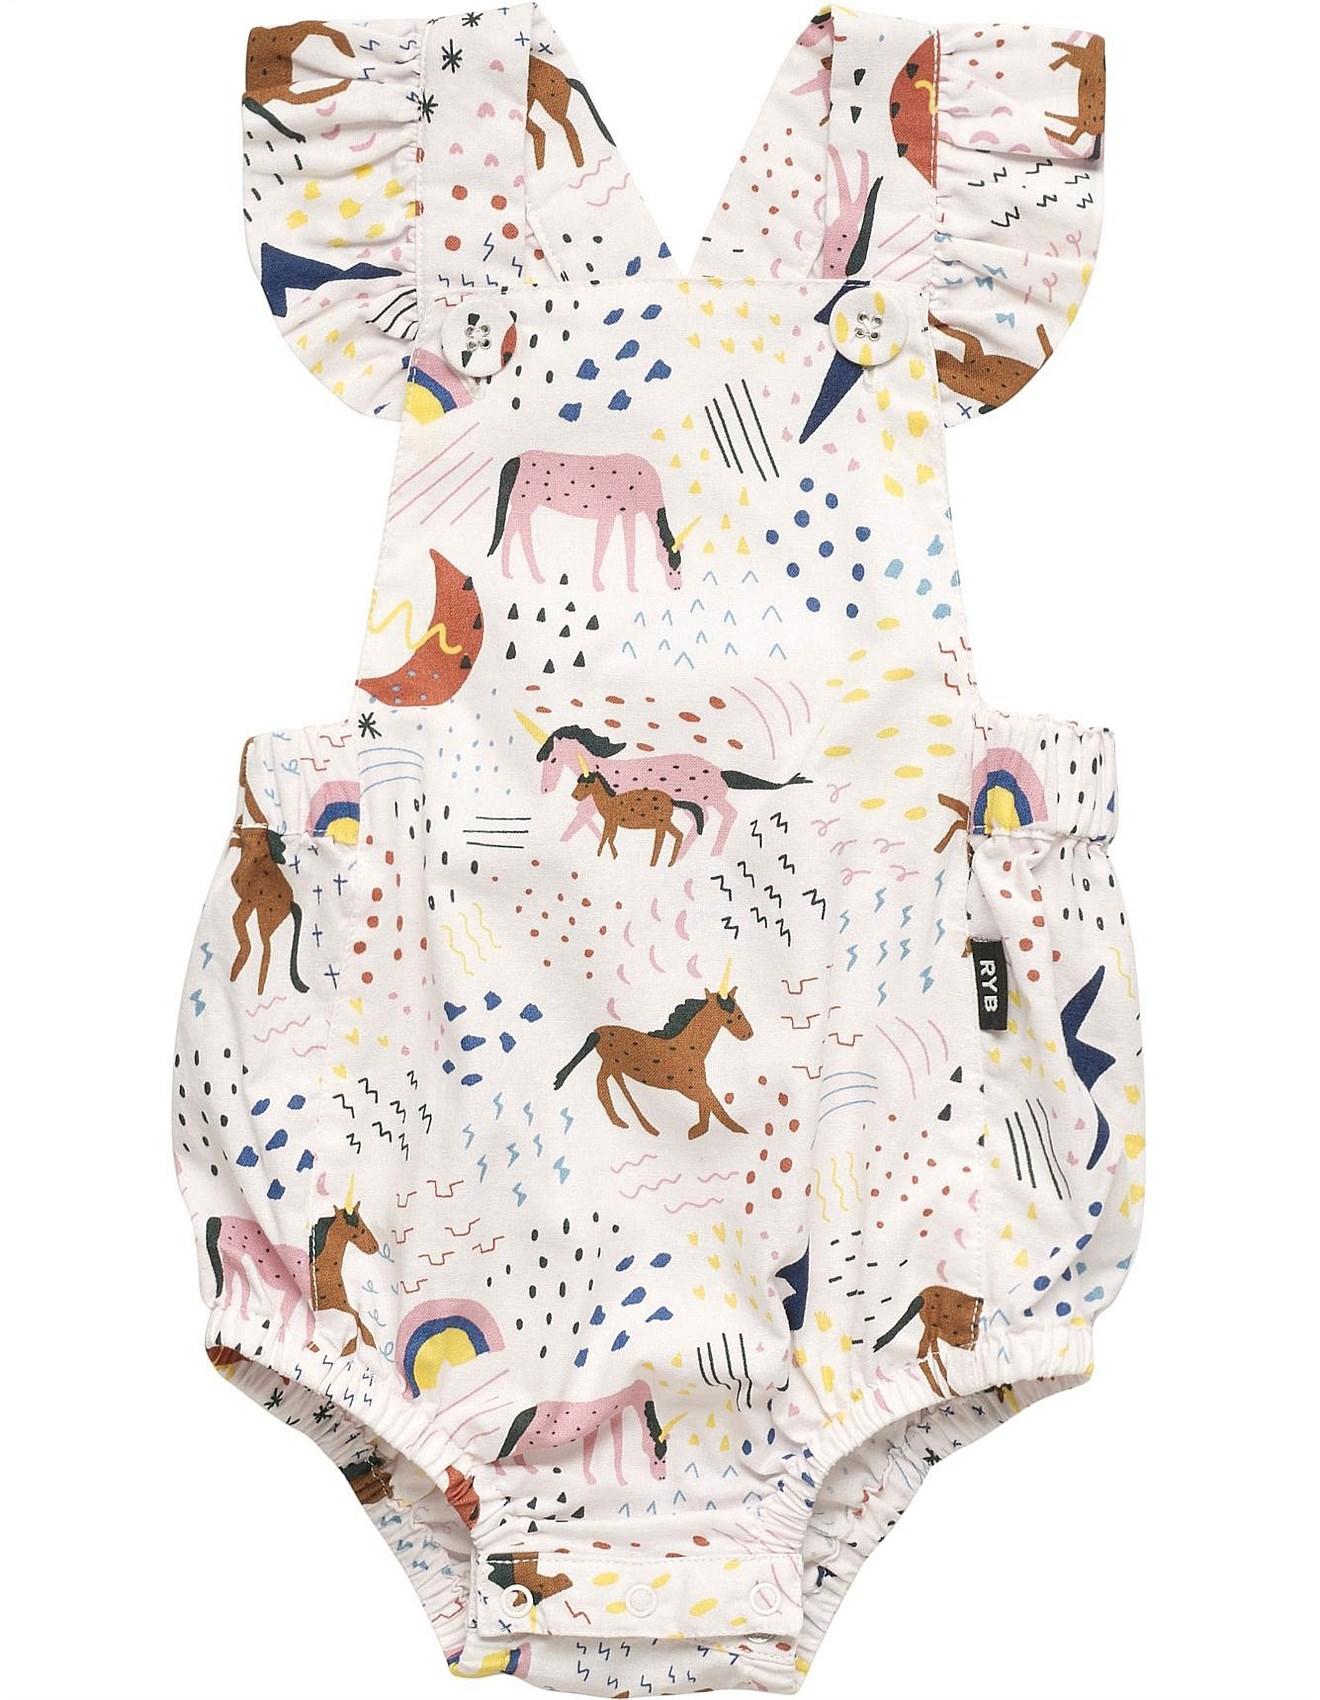 ff6b0045b90 Baby Rompers